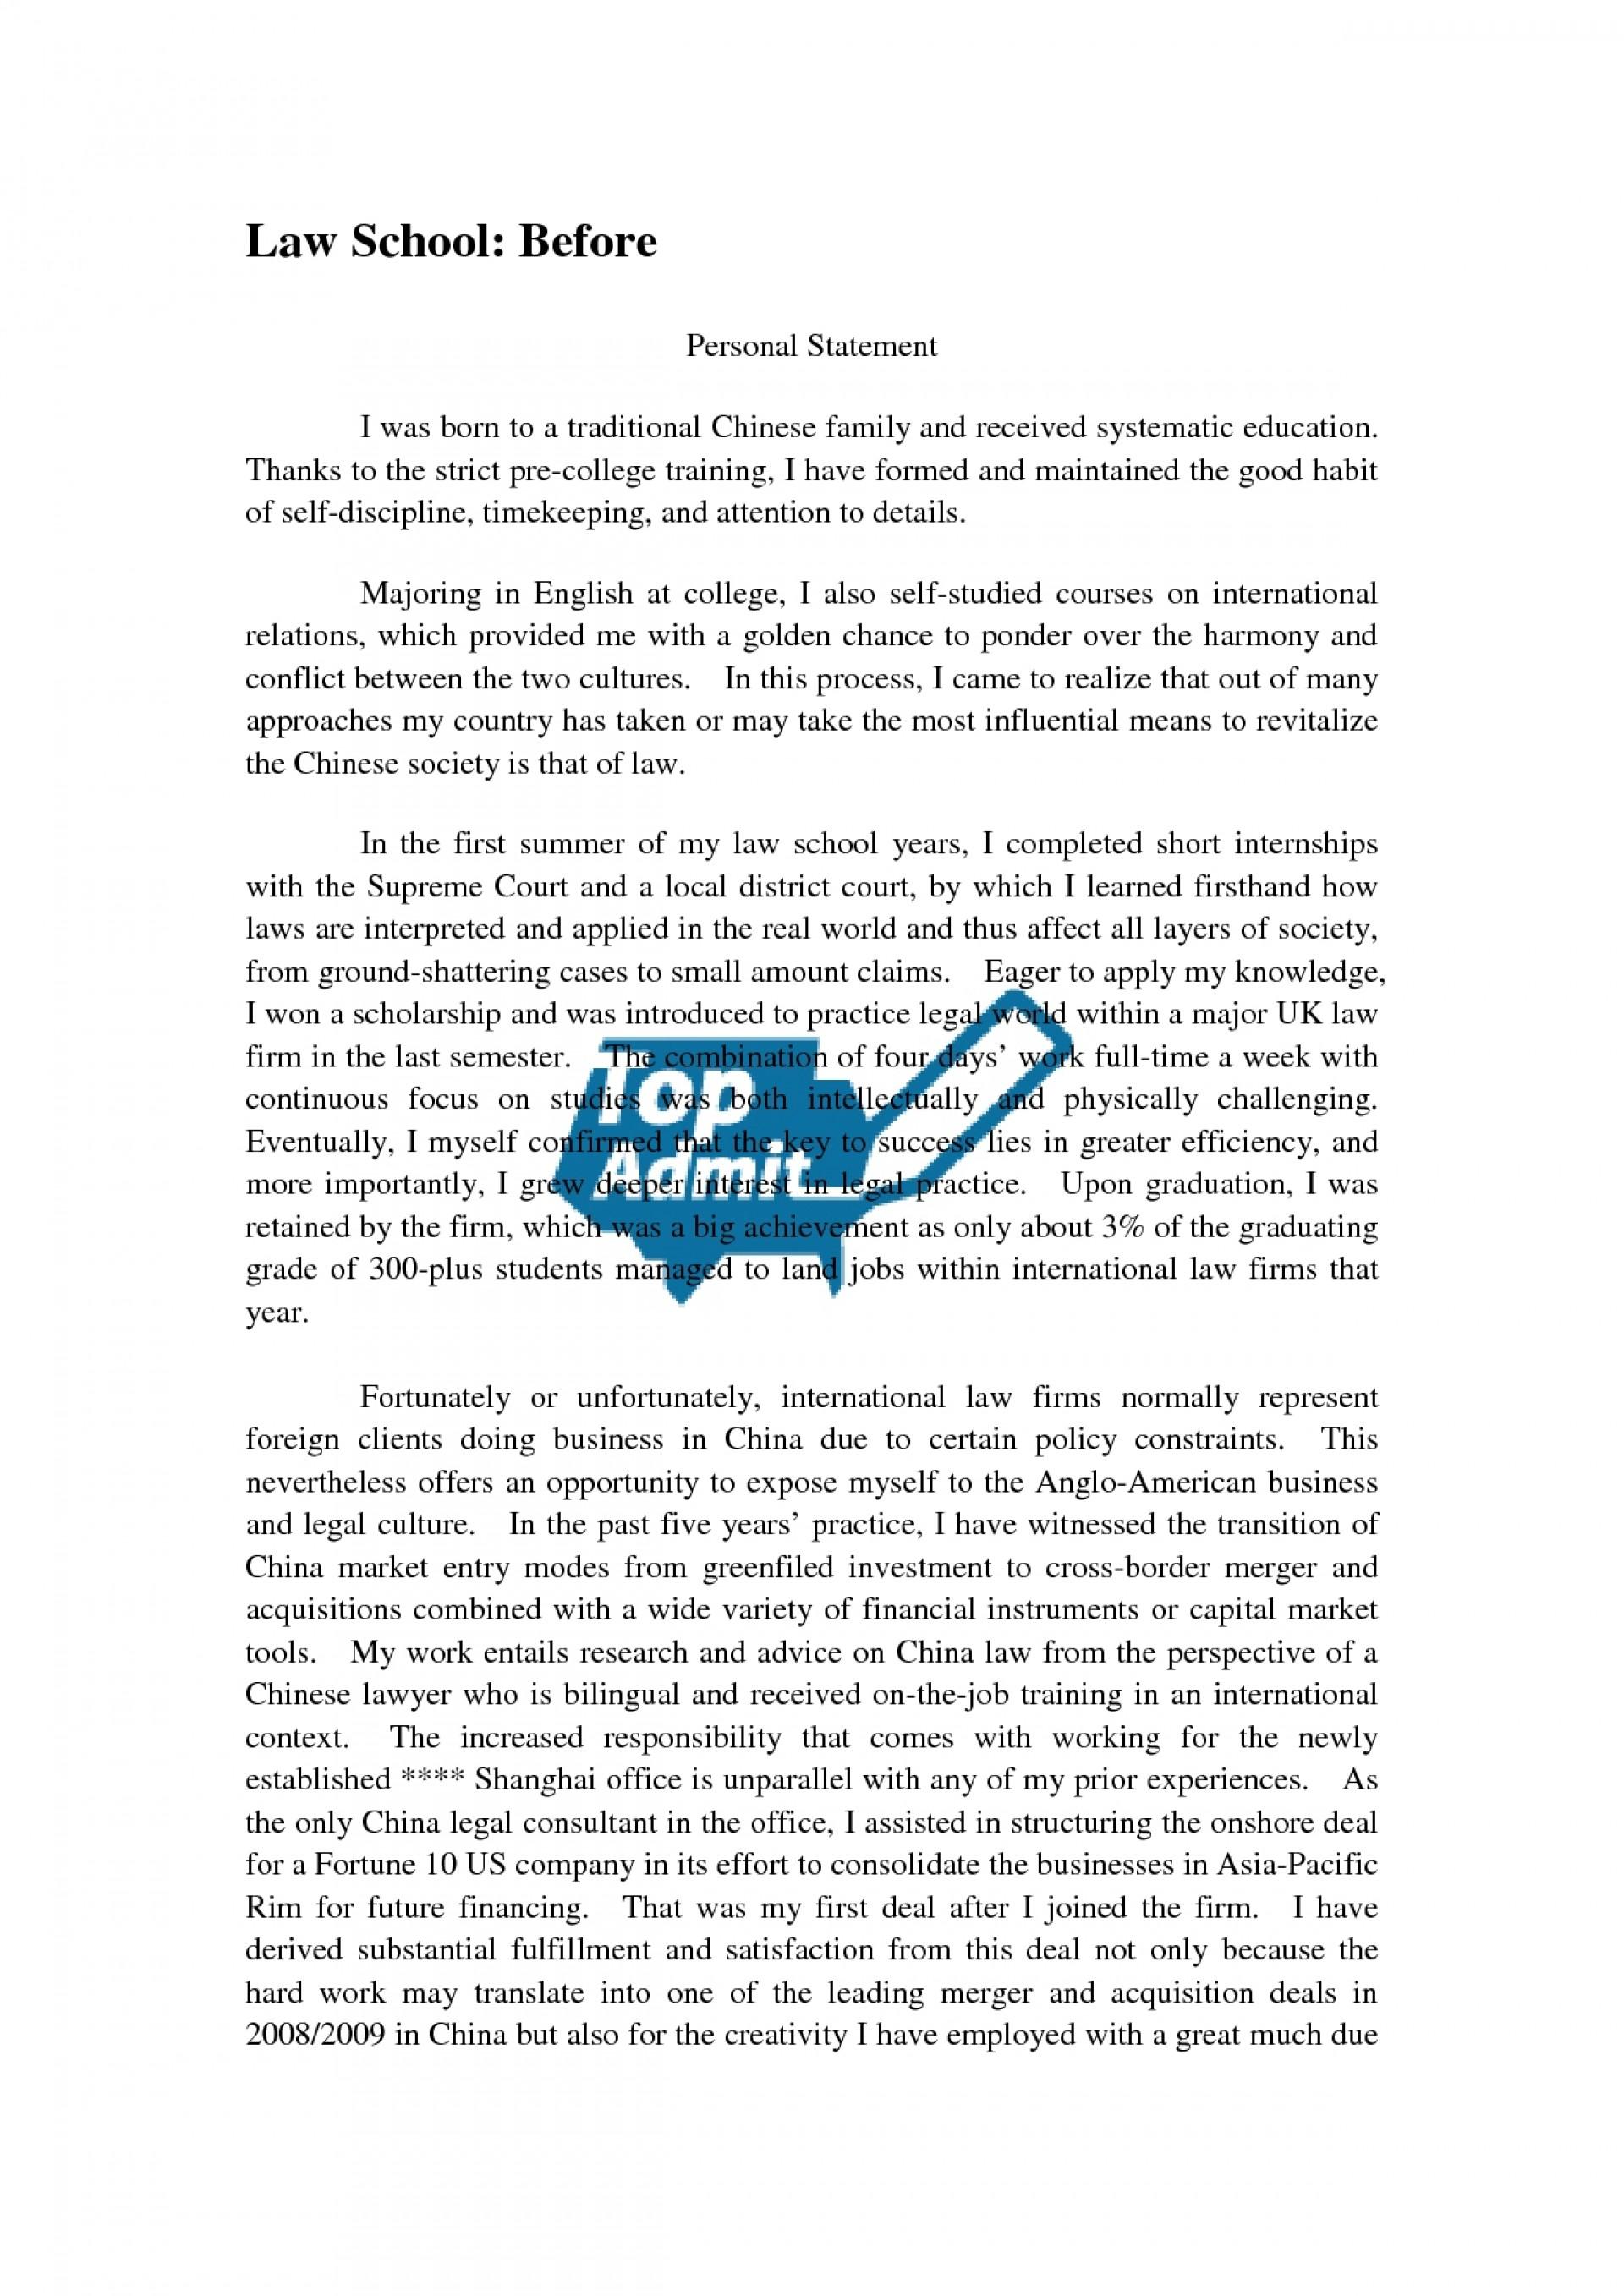 022 Ty6thpg Essay Example Statement Of Purpose Graduate School Sample Top Essays Examples Mba Nursing 1920